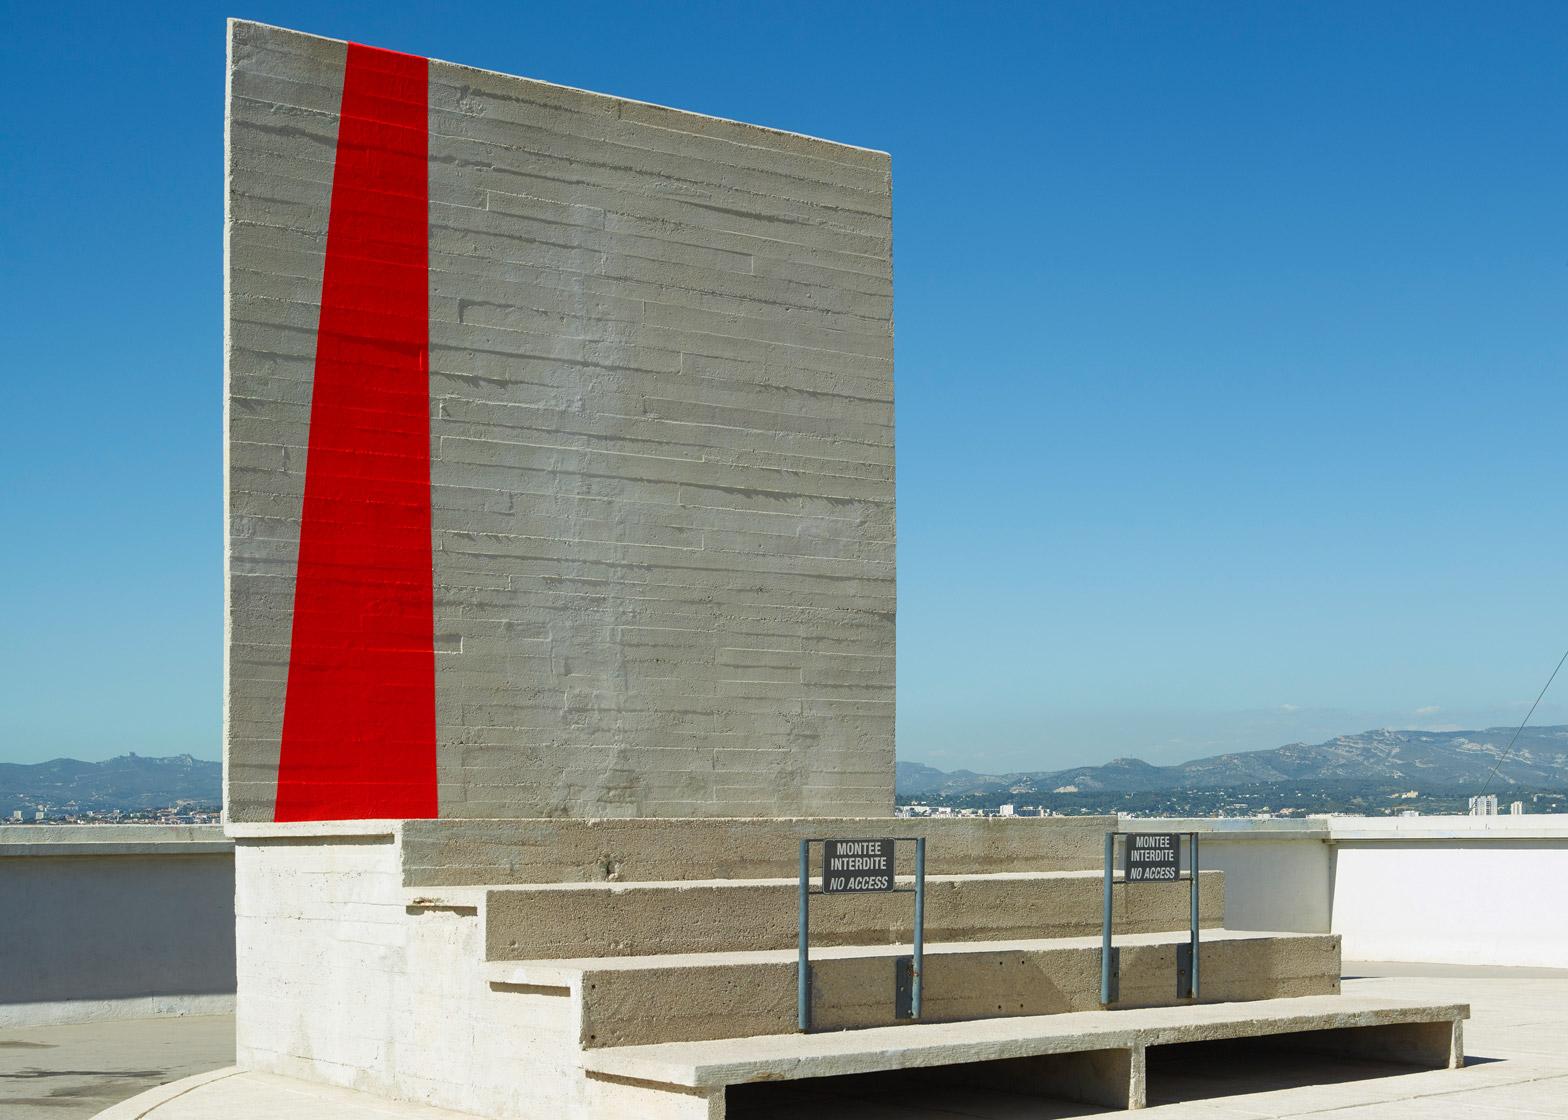 Le Corbusier Unite D Habitation felice varini creates optical illusion at le corbusier's